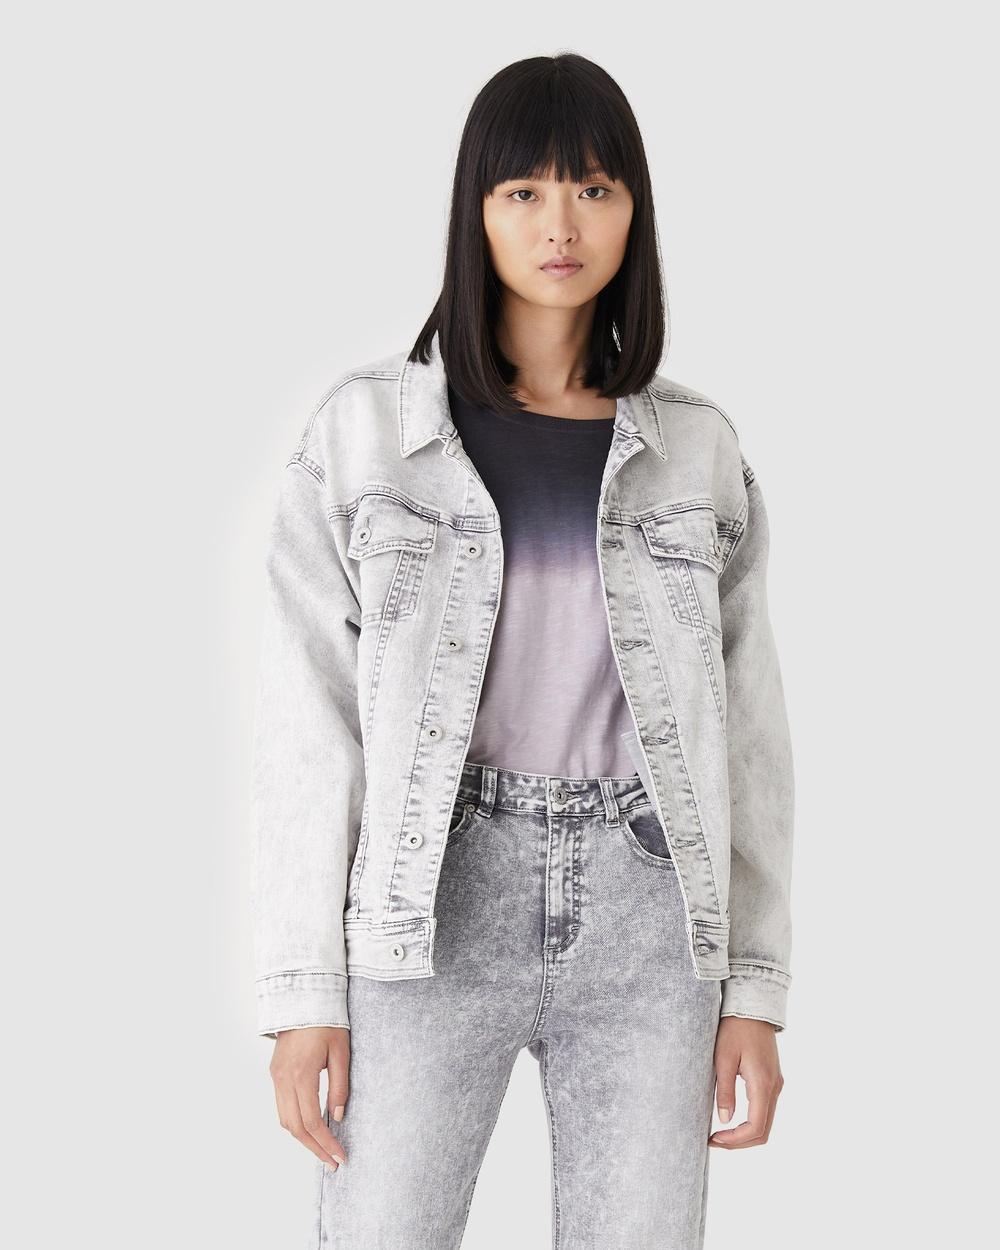 Jac & Mooki Delta Trucker Jacket Denim jacket grey wash Australia